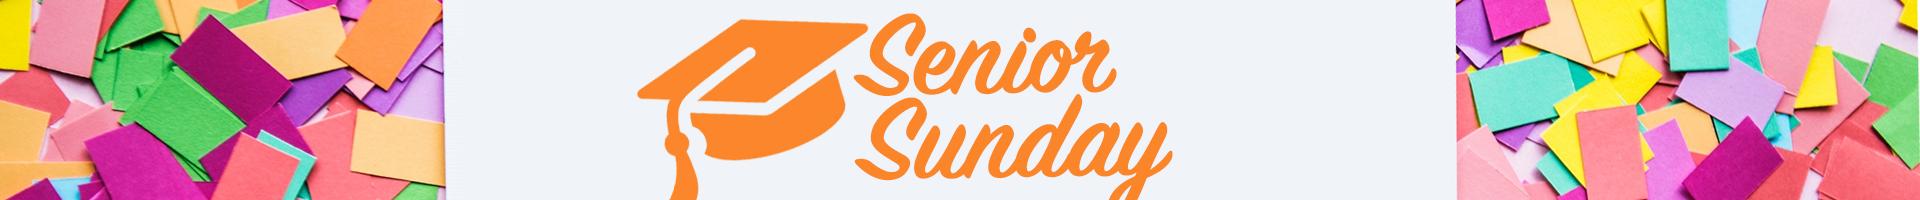 Senior Sunday Strip.png